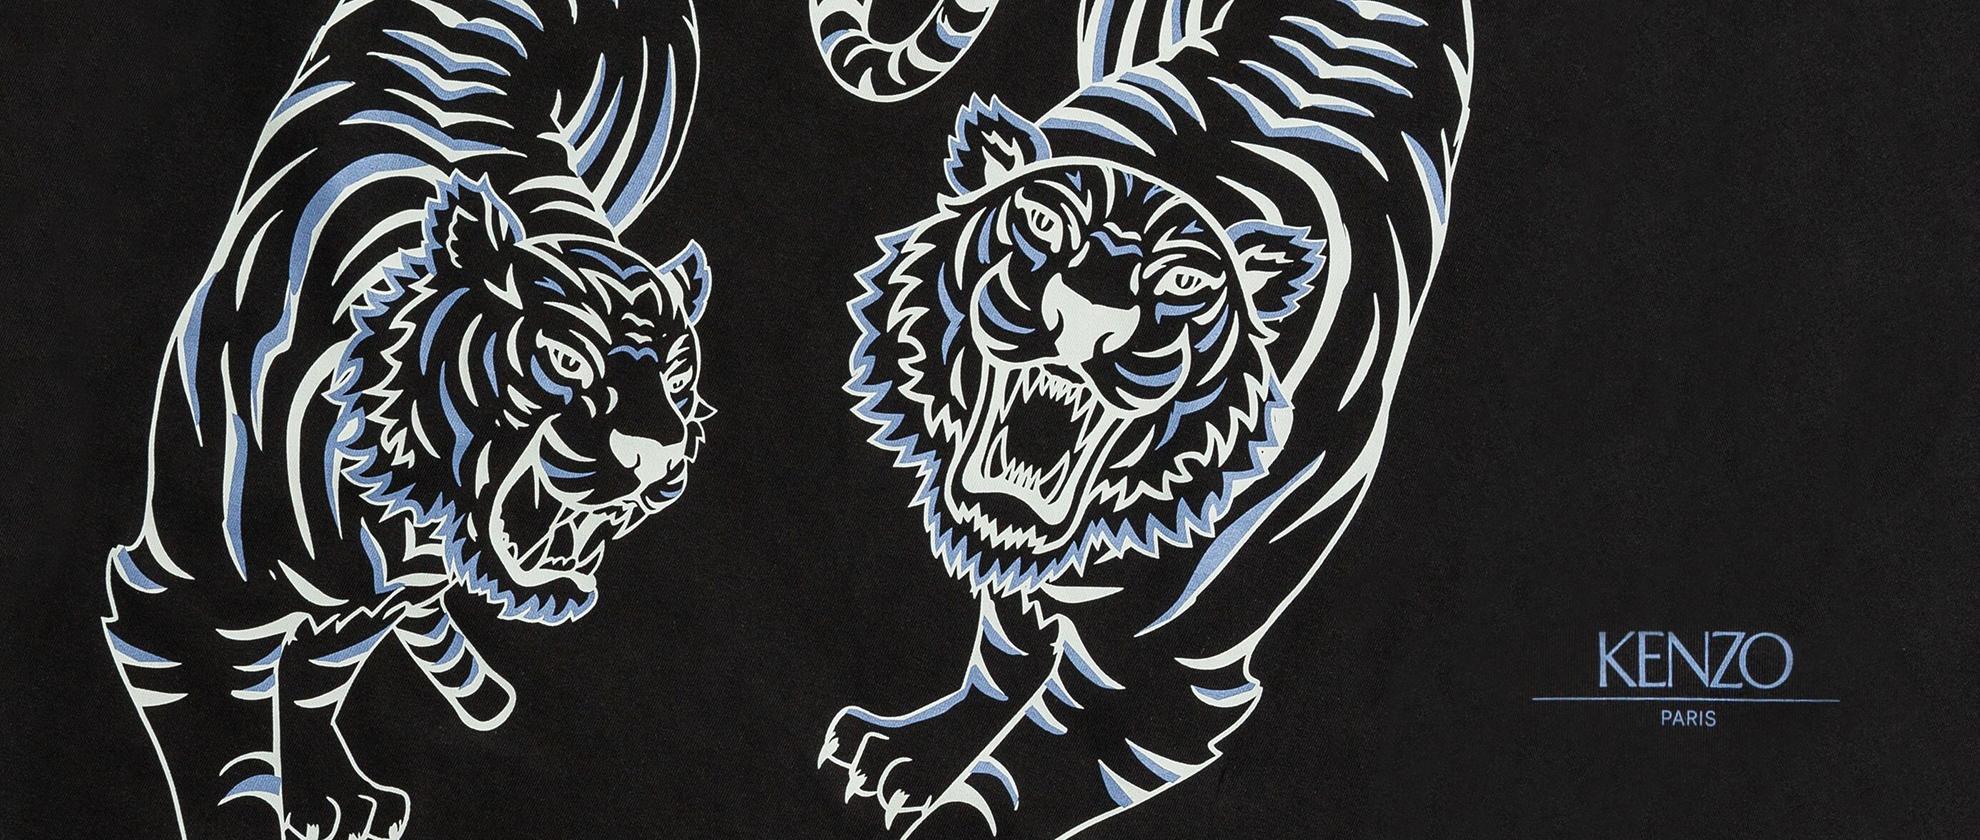 Staff Pick: KENZO Two Tiger Print T-Shirt